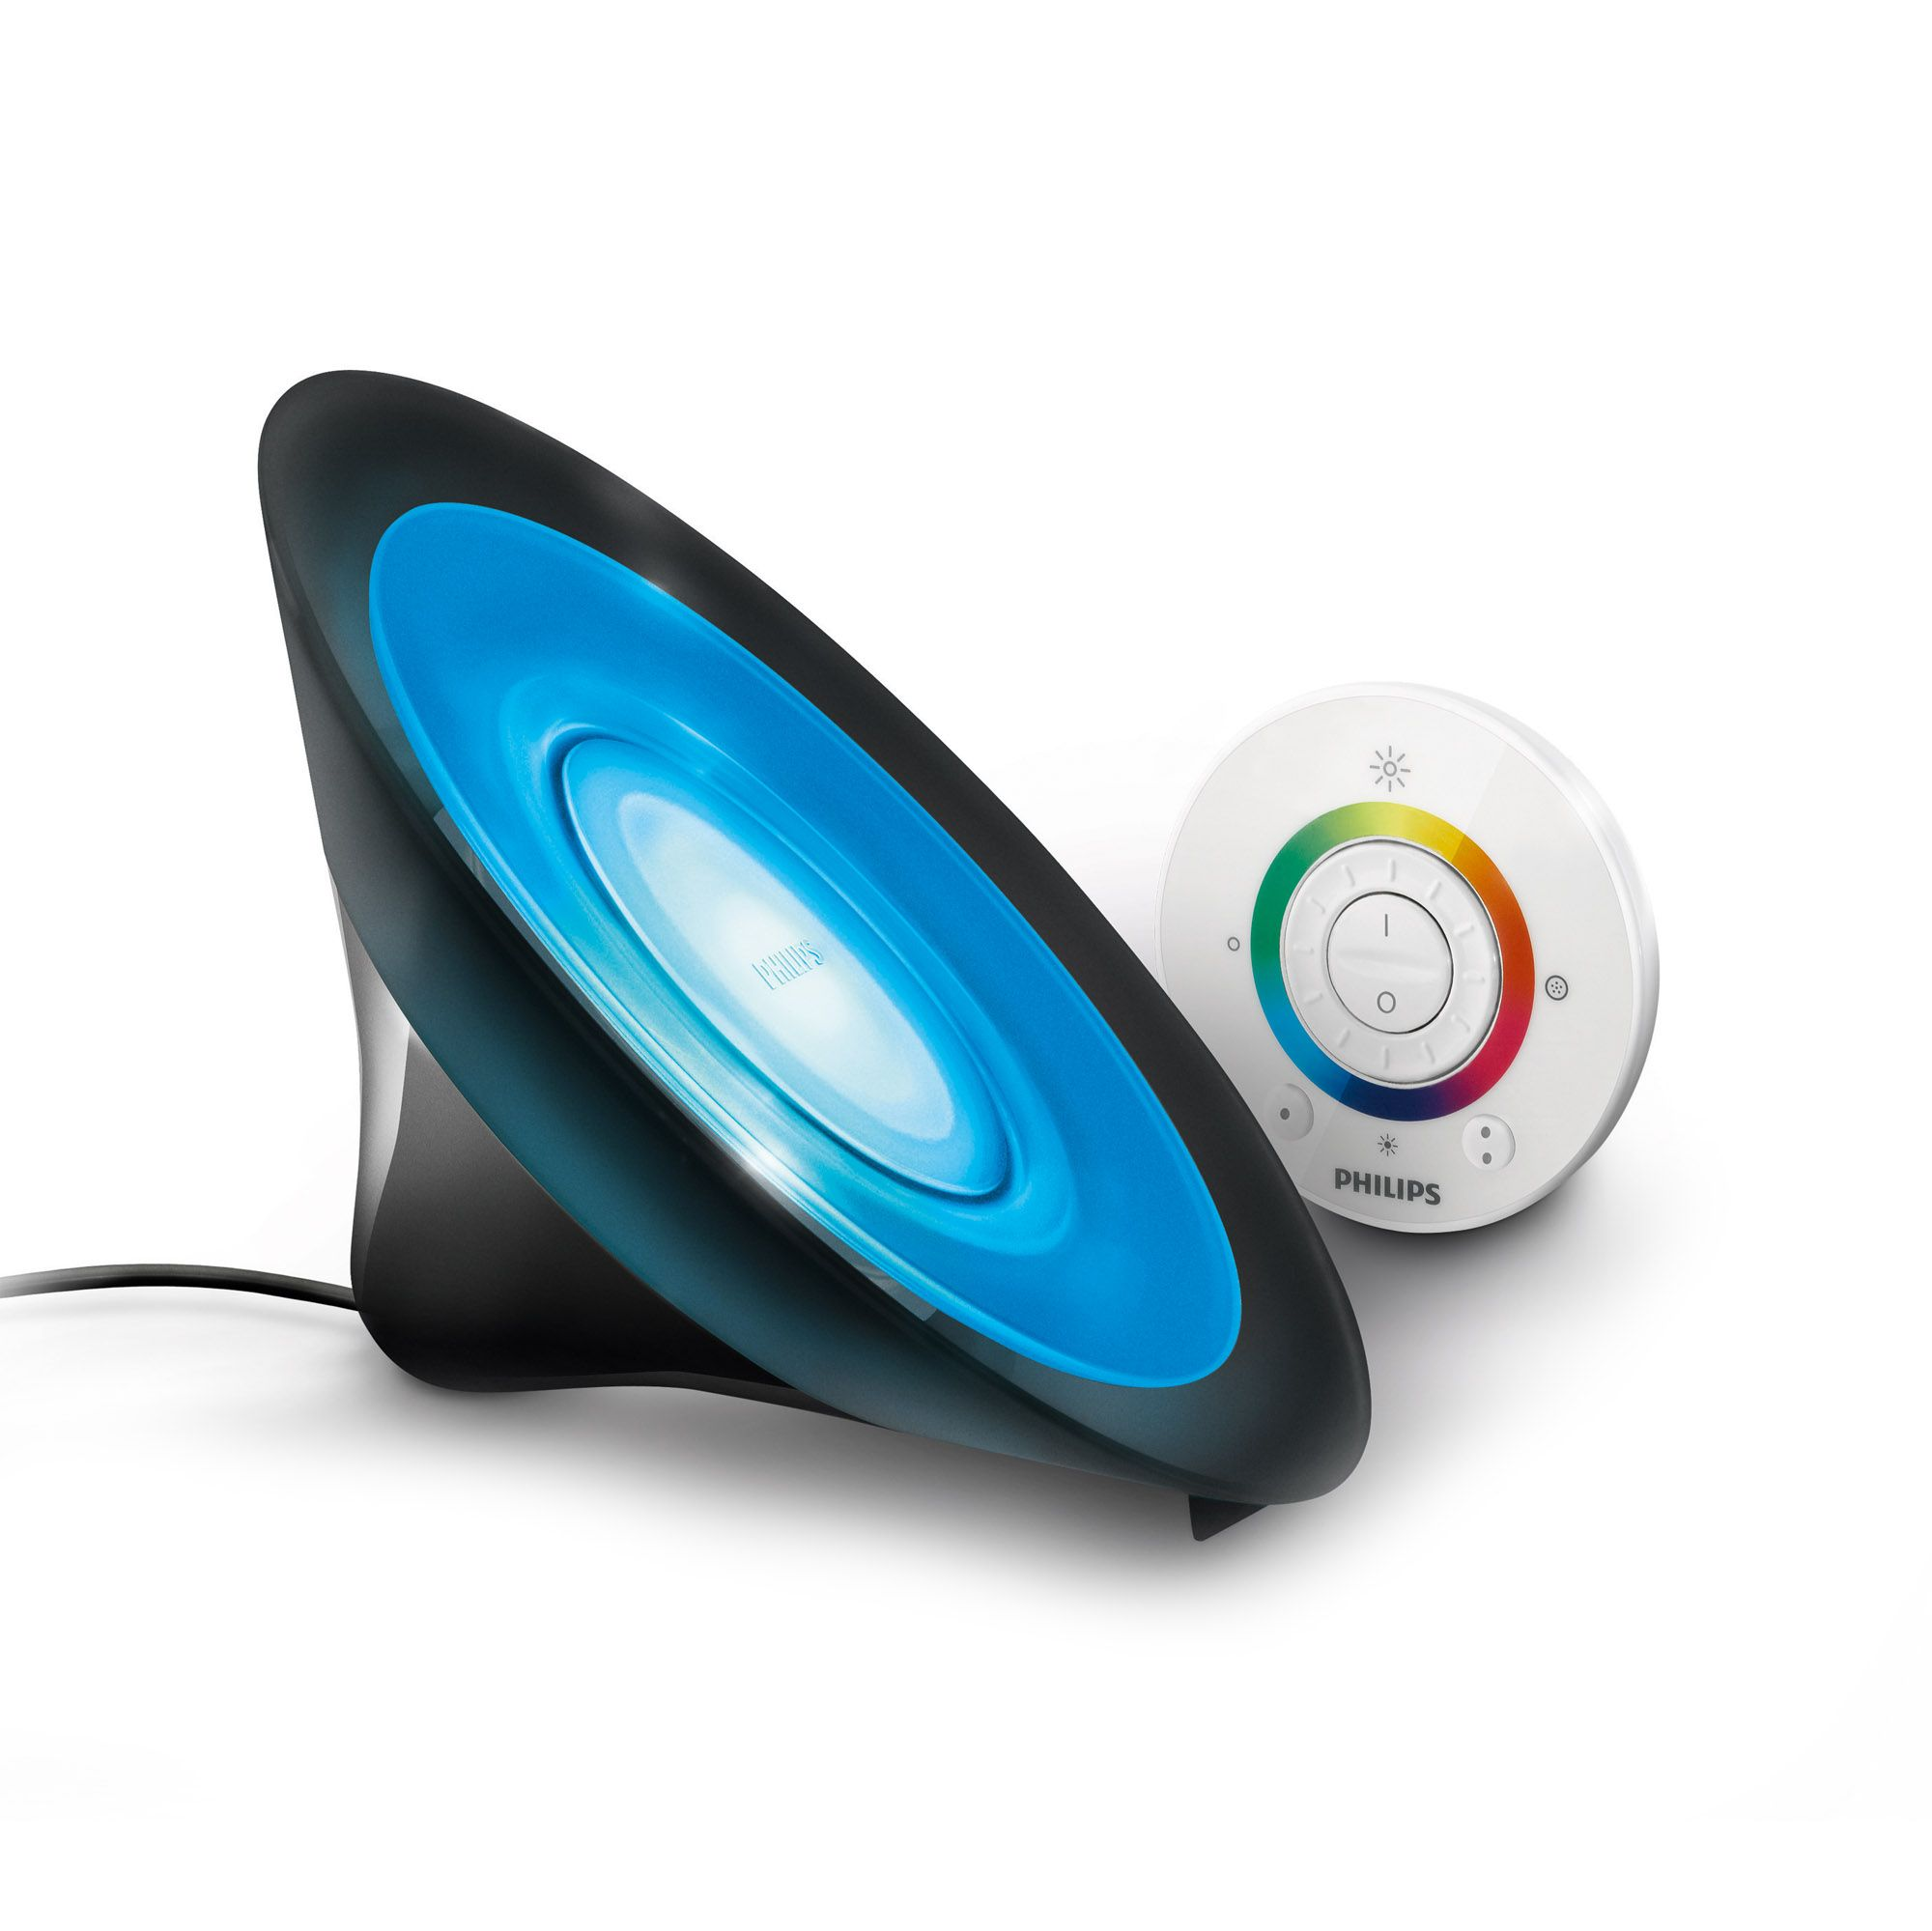 Livingcolors aura lampada led con telecomando qvc italia for Philips telecomando